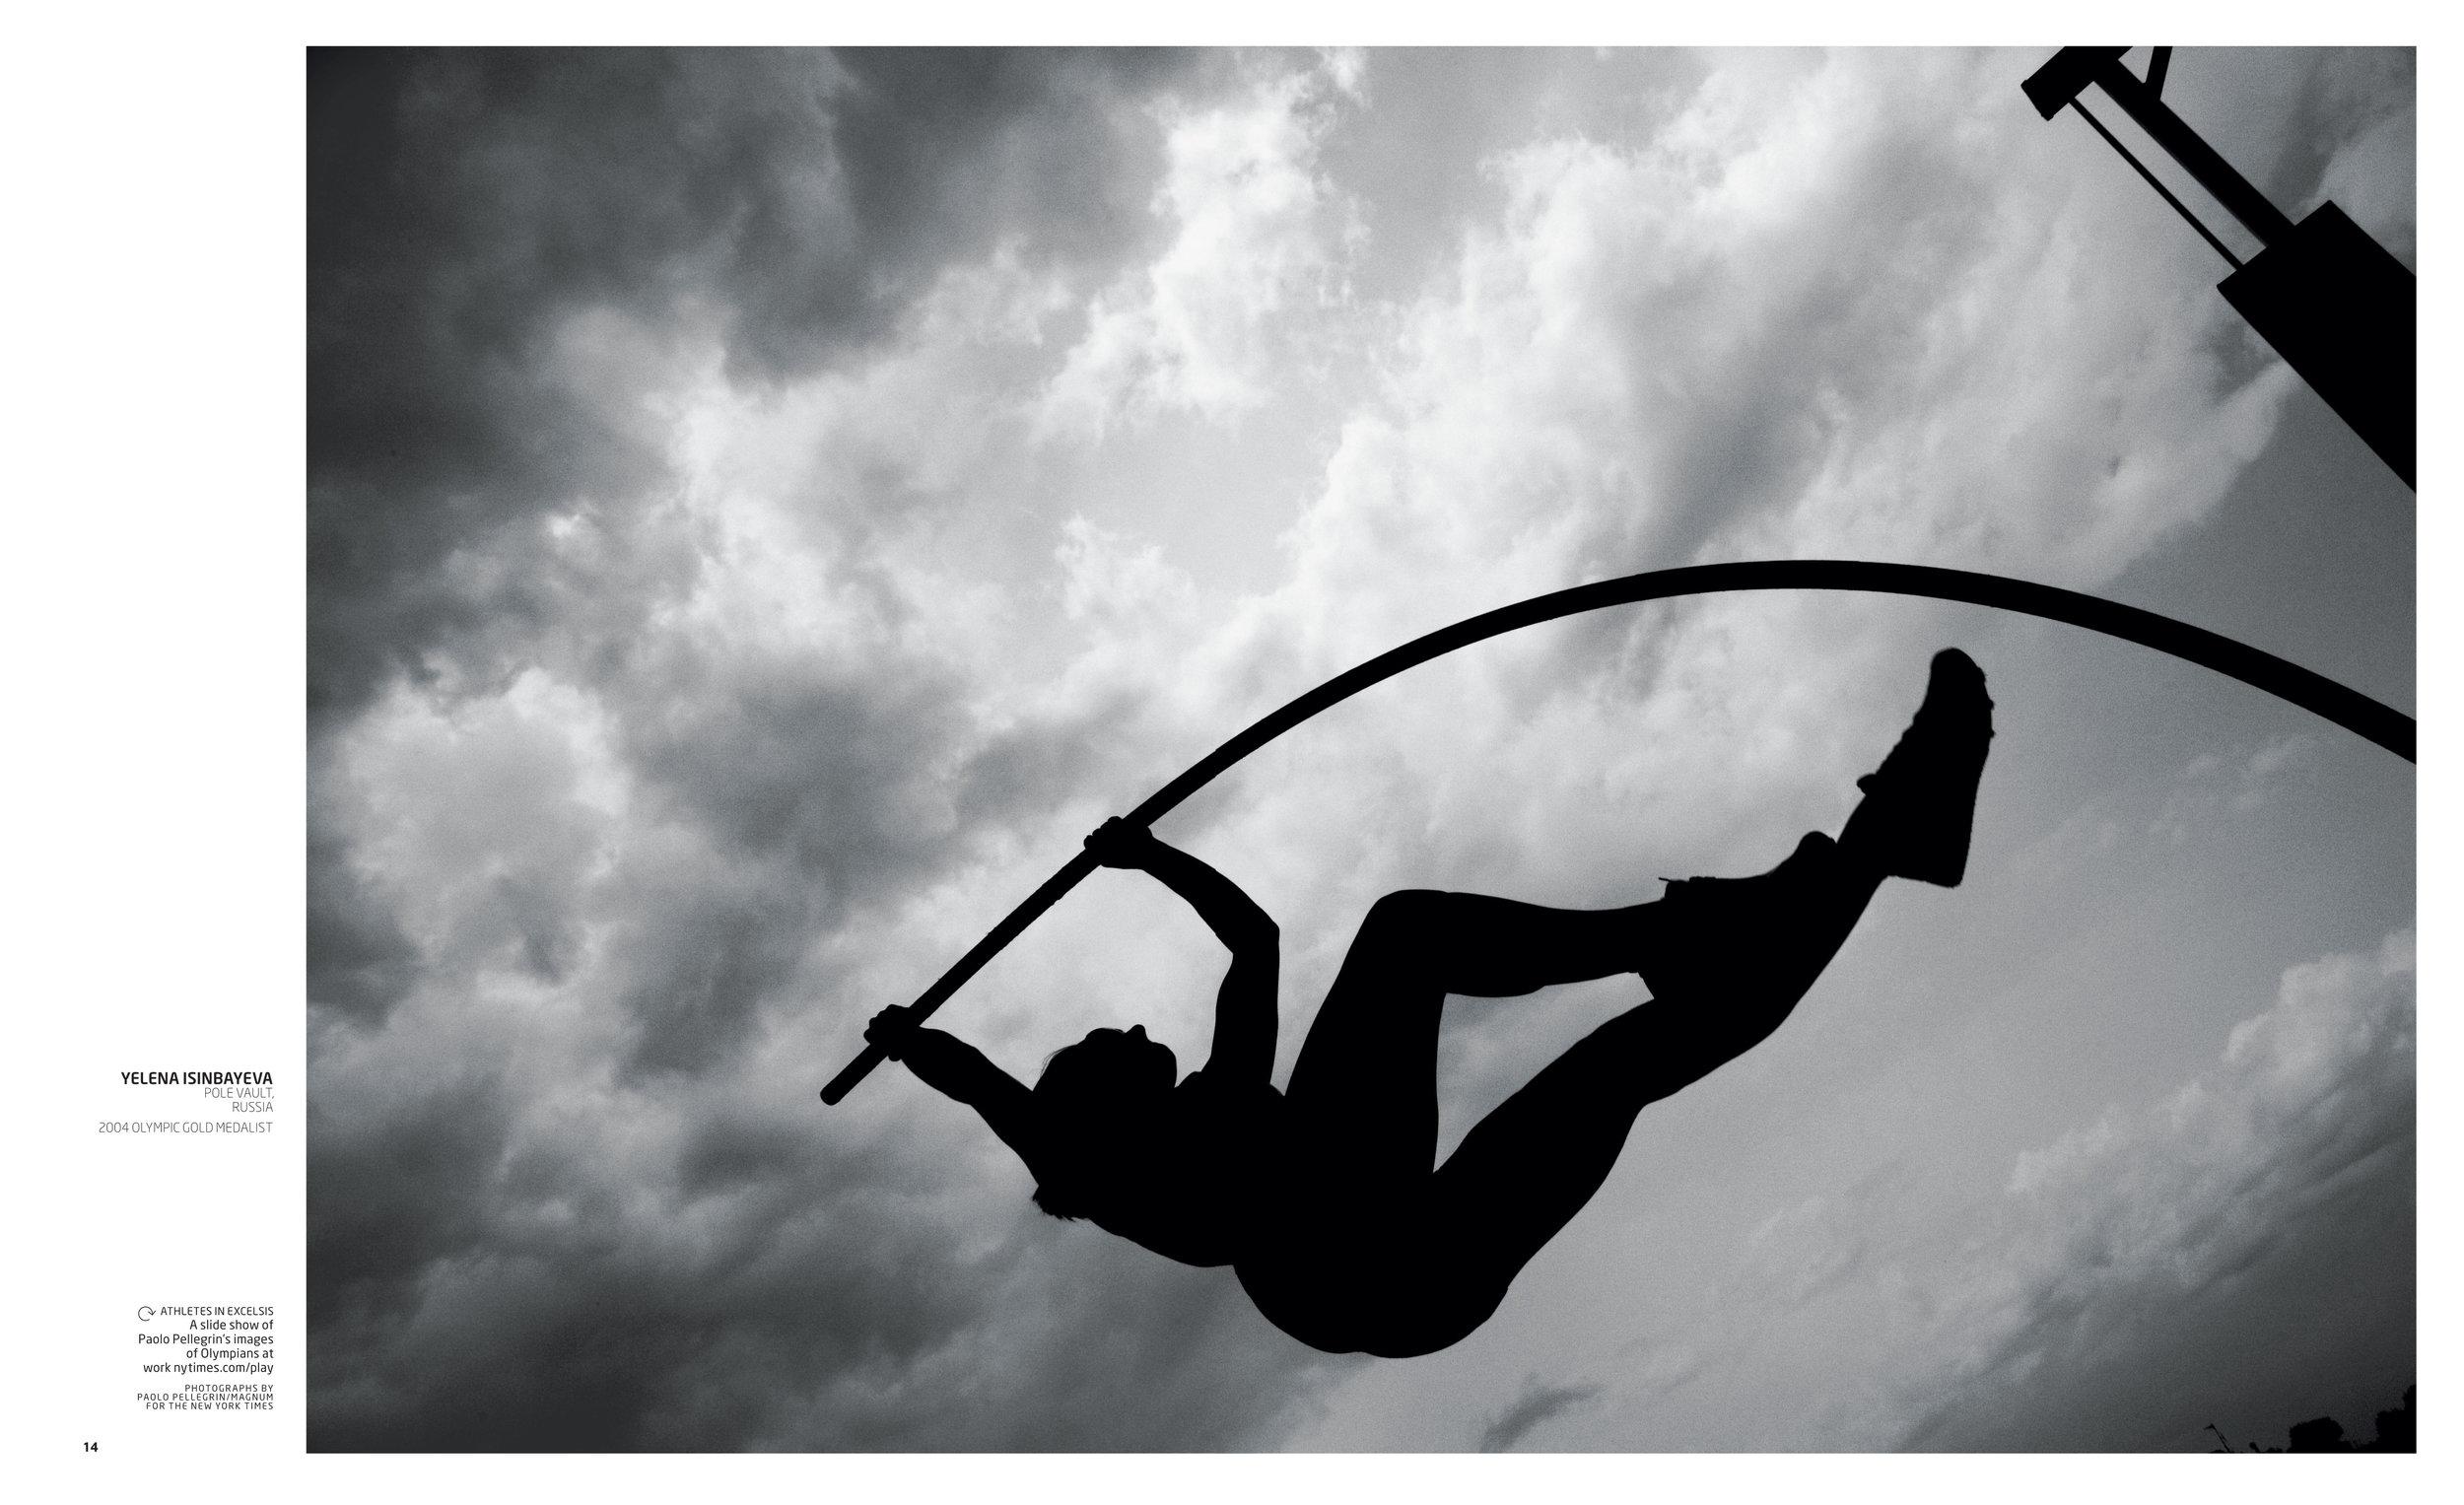 08.03.2008.Olympics.Pellegrin.03.jpg